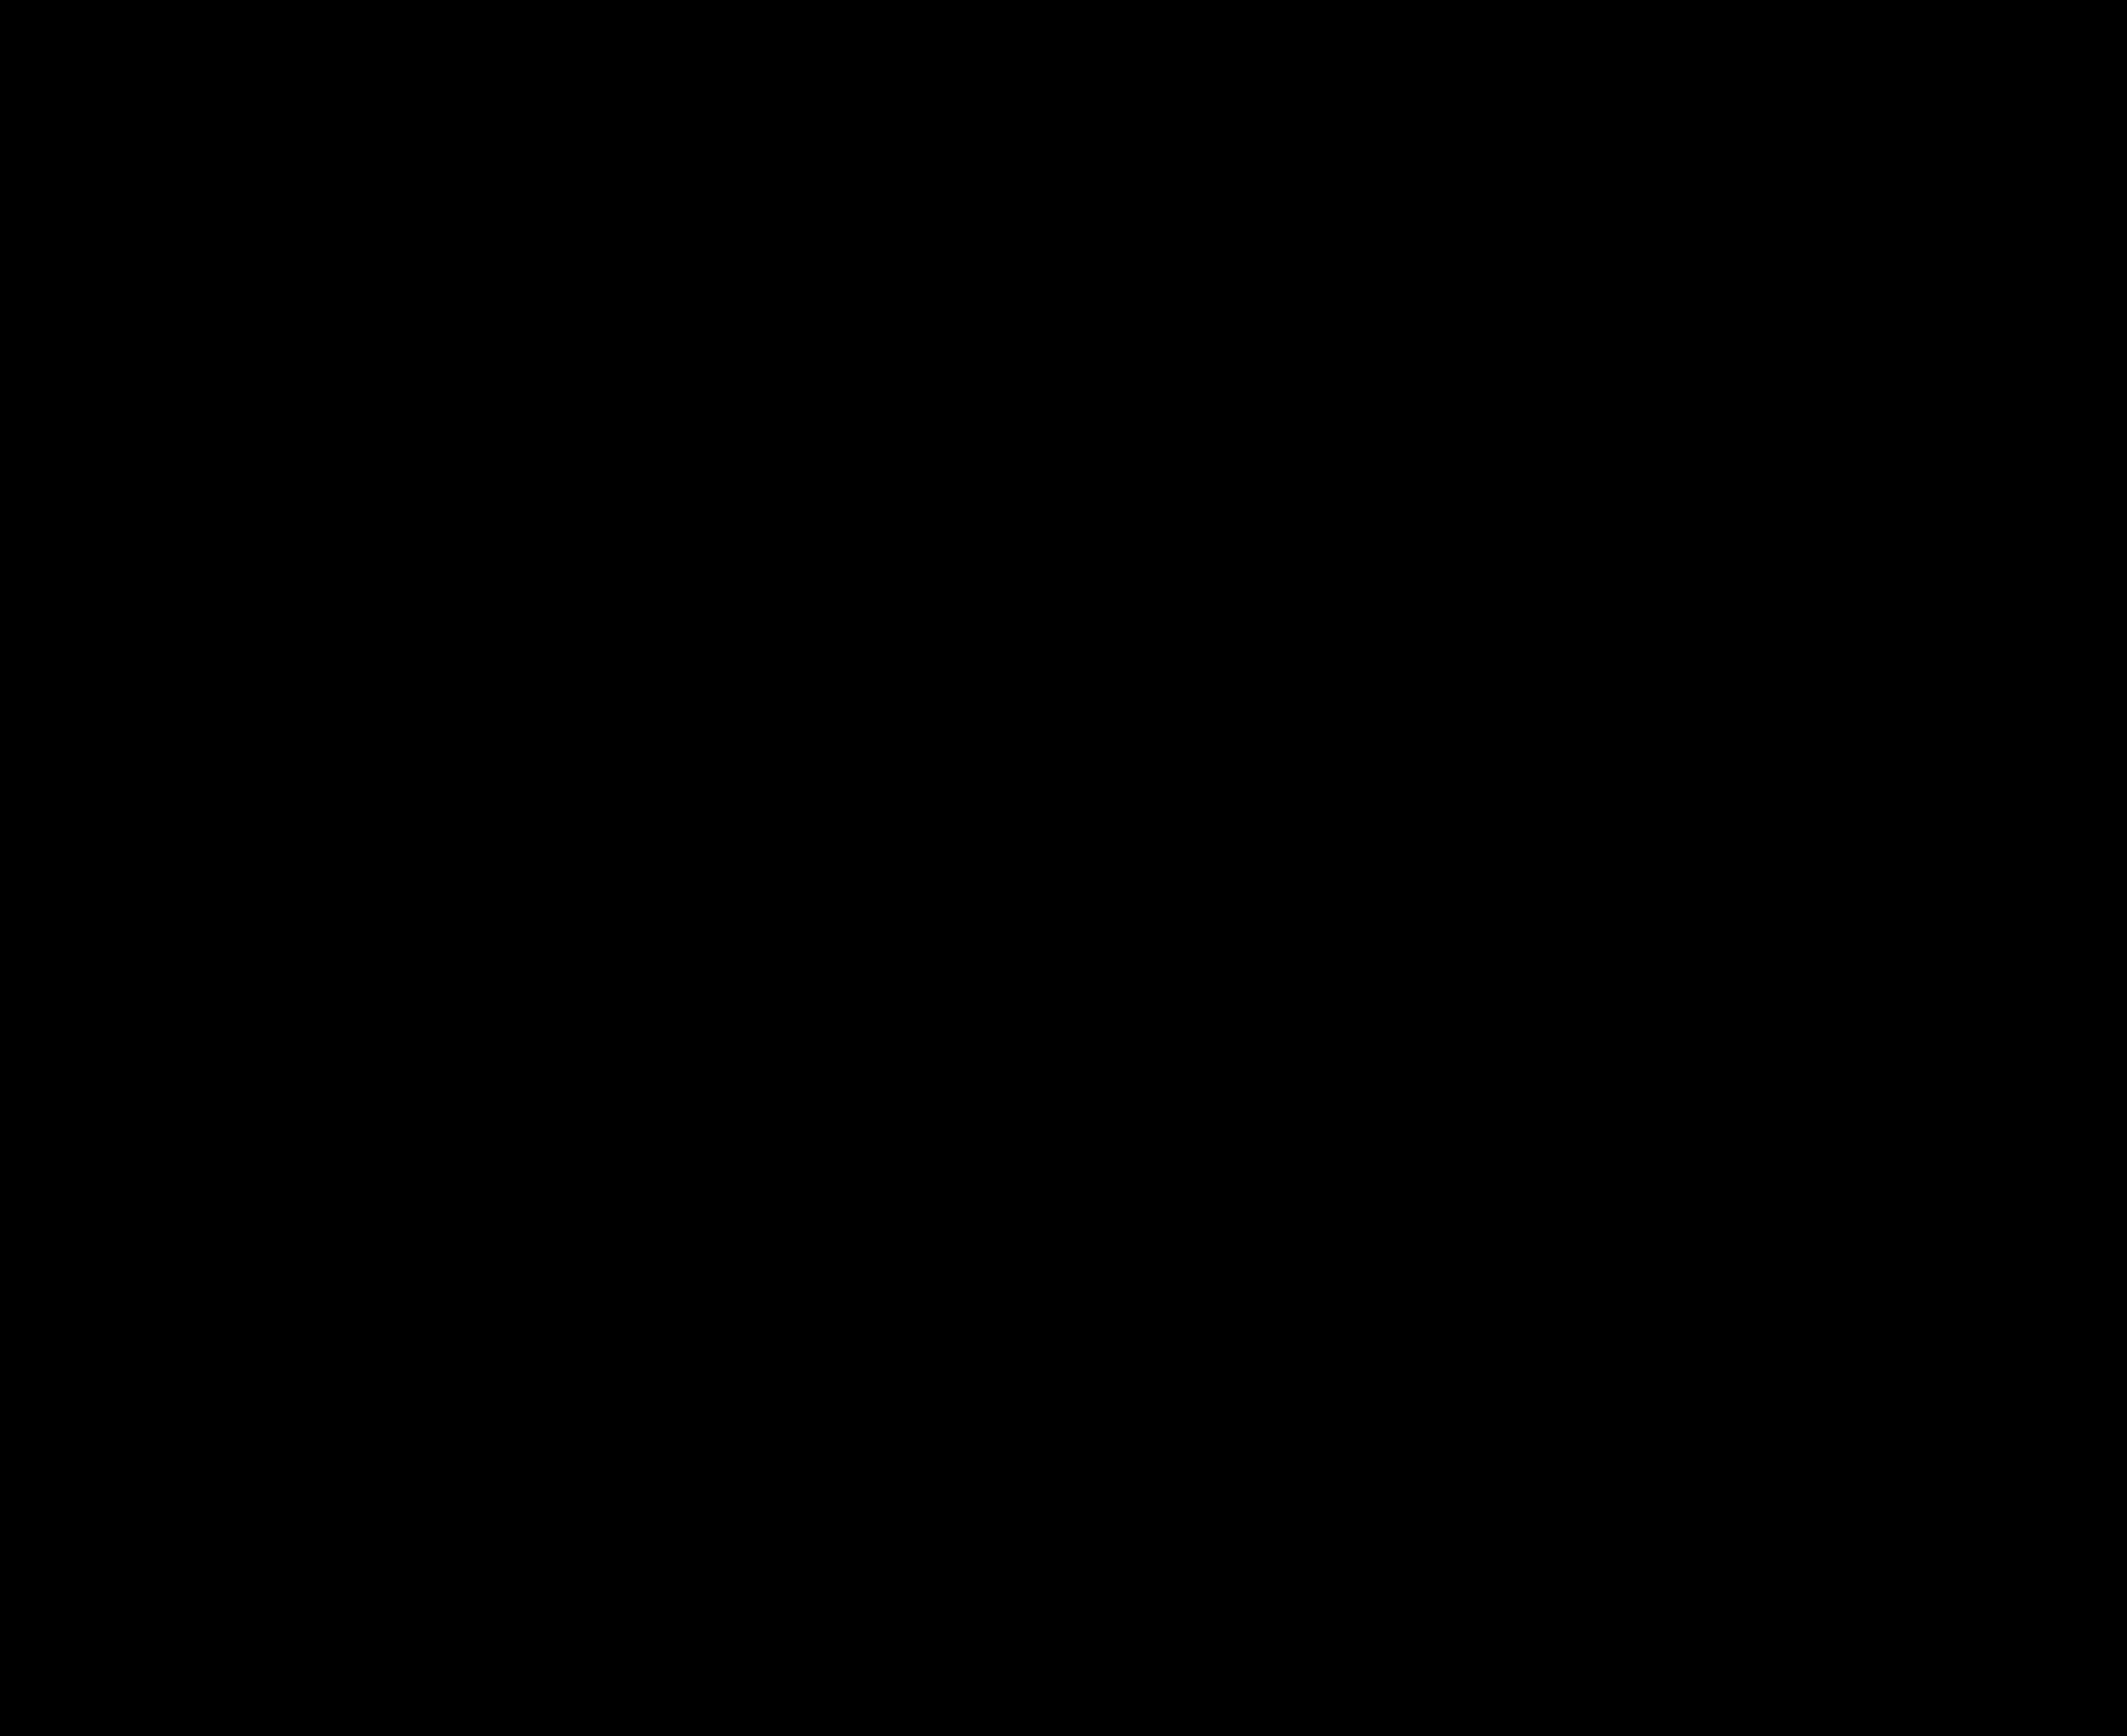 logo_czarny